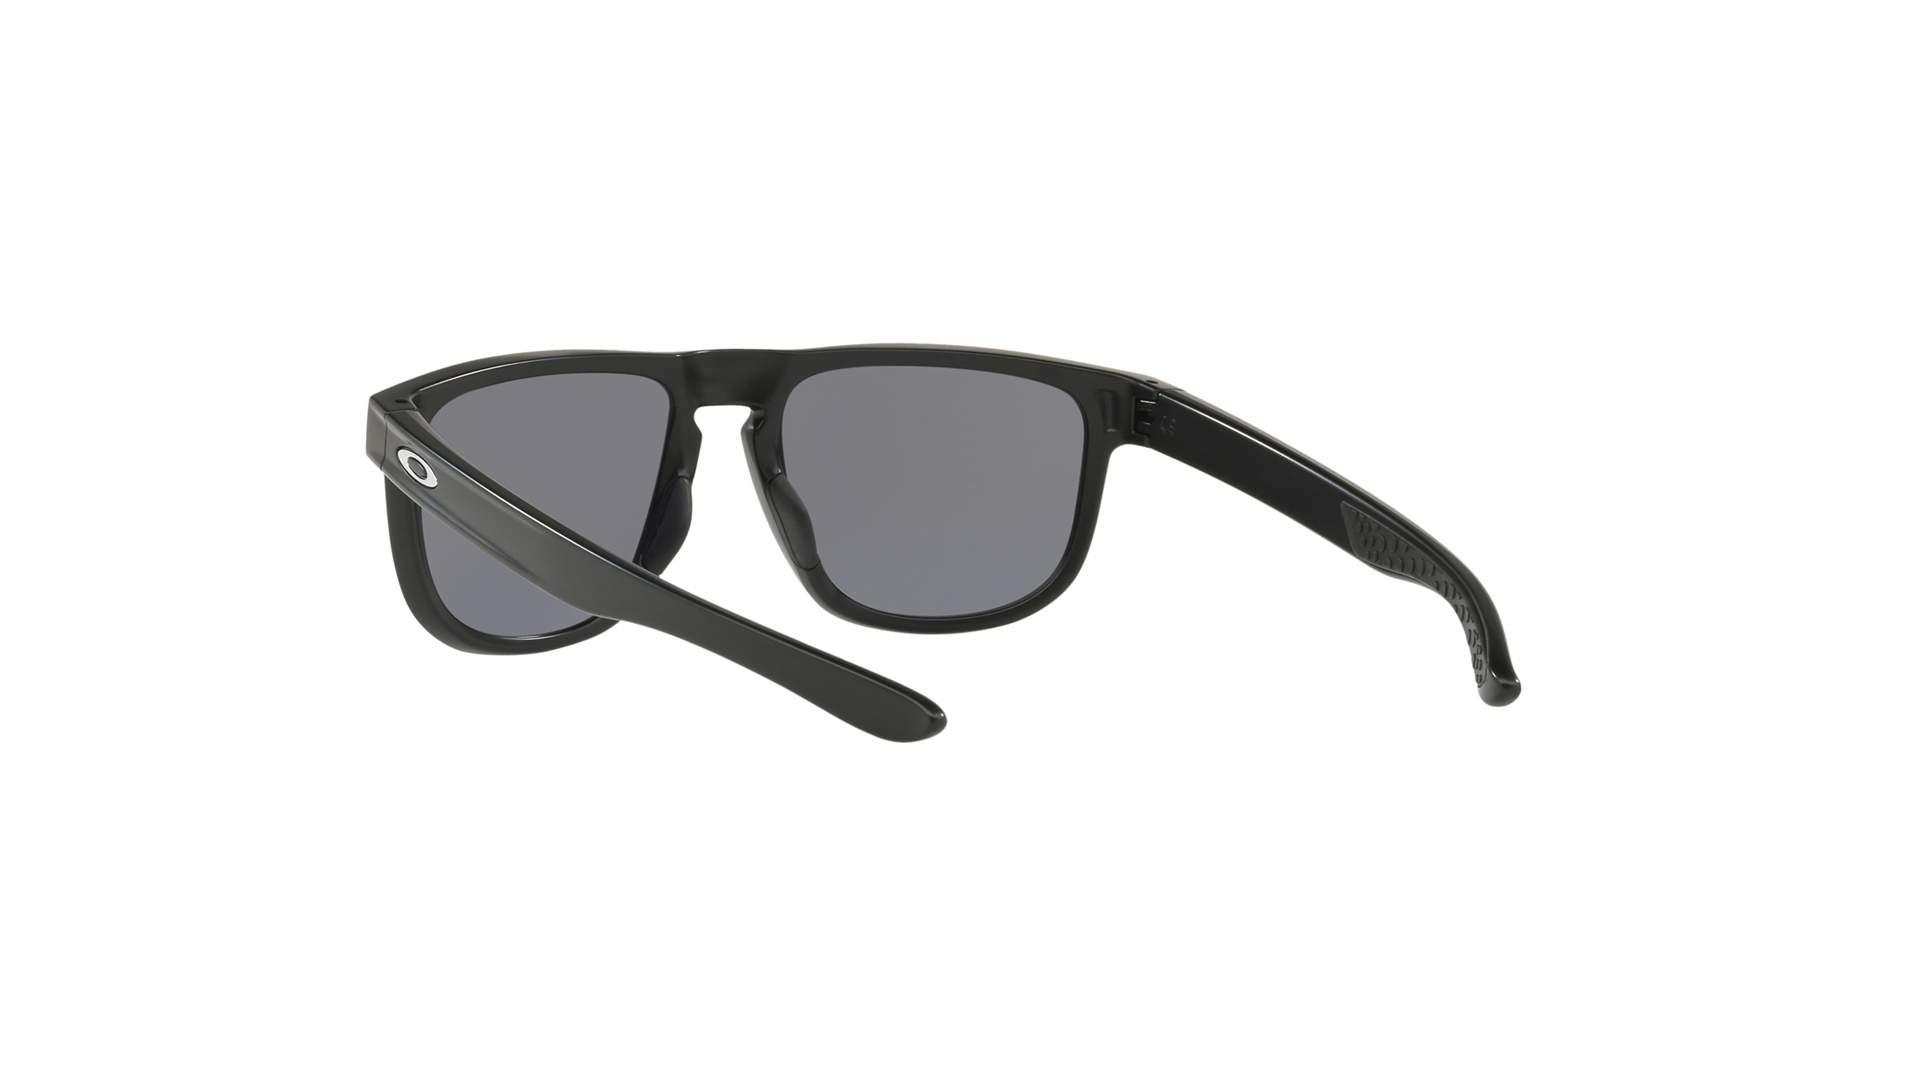 379377c72a3 Sunglasses Oakley Holbrook R Black Matte OO9377 01 55-17 Large